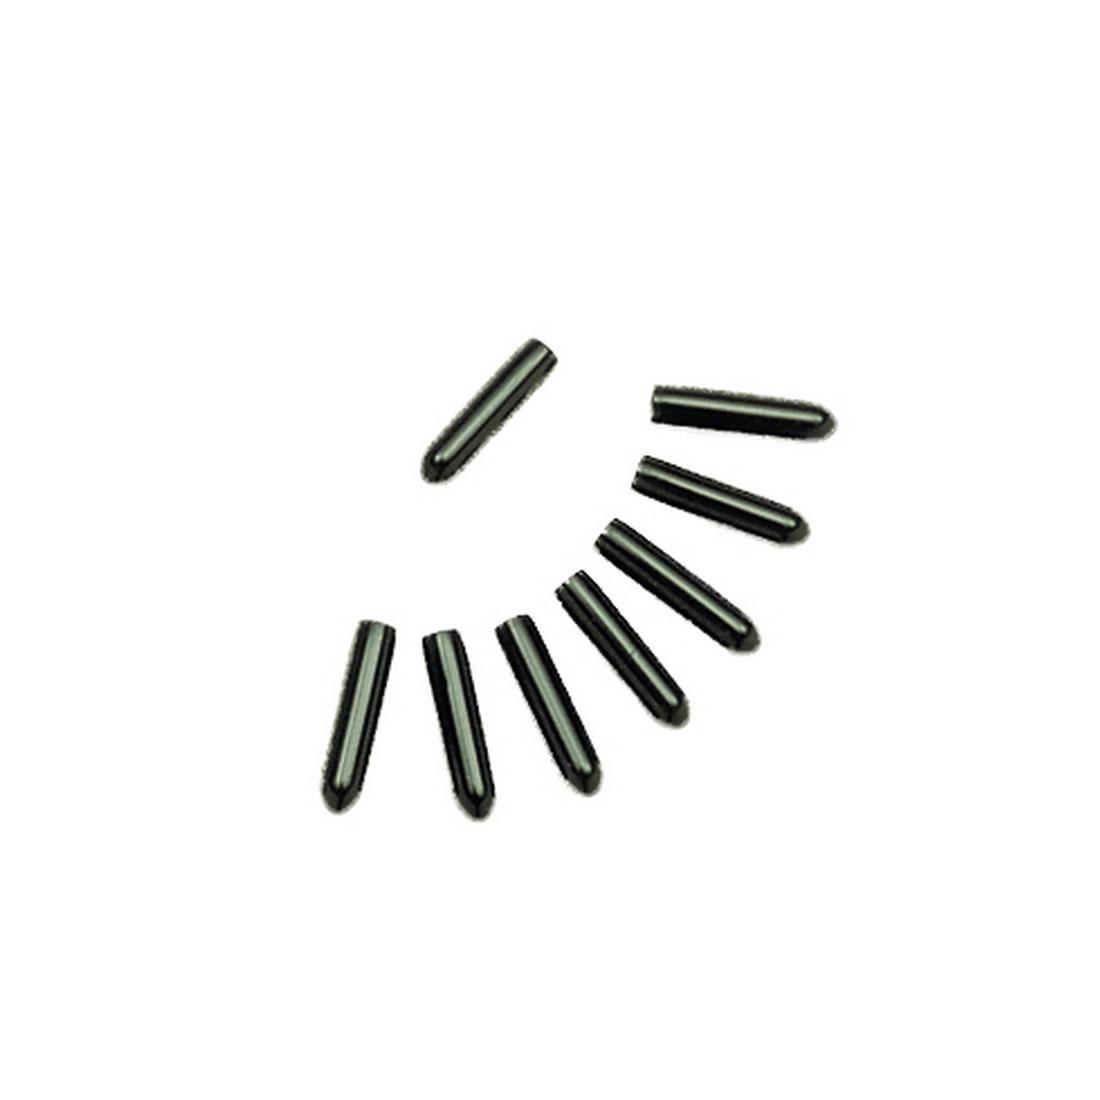 Coastal Titan Vinyl Comfort Tips for Dog Prong Training Collars, Black, 3.3-mm